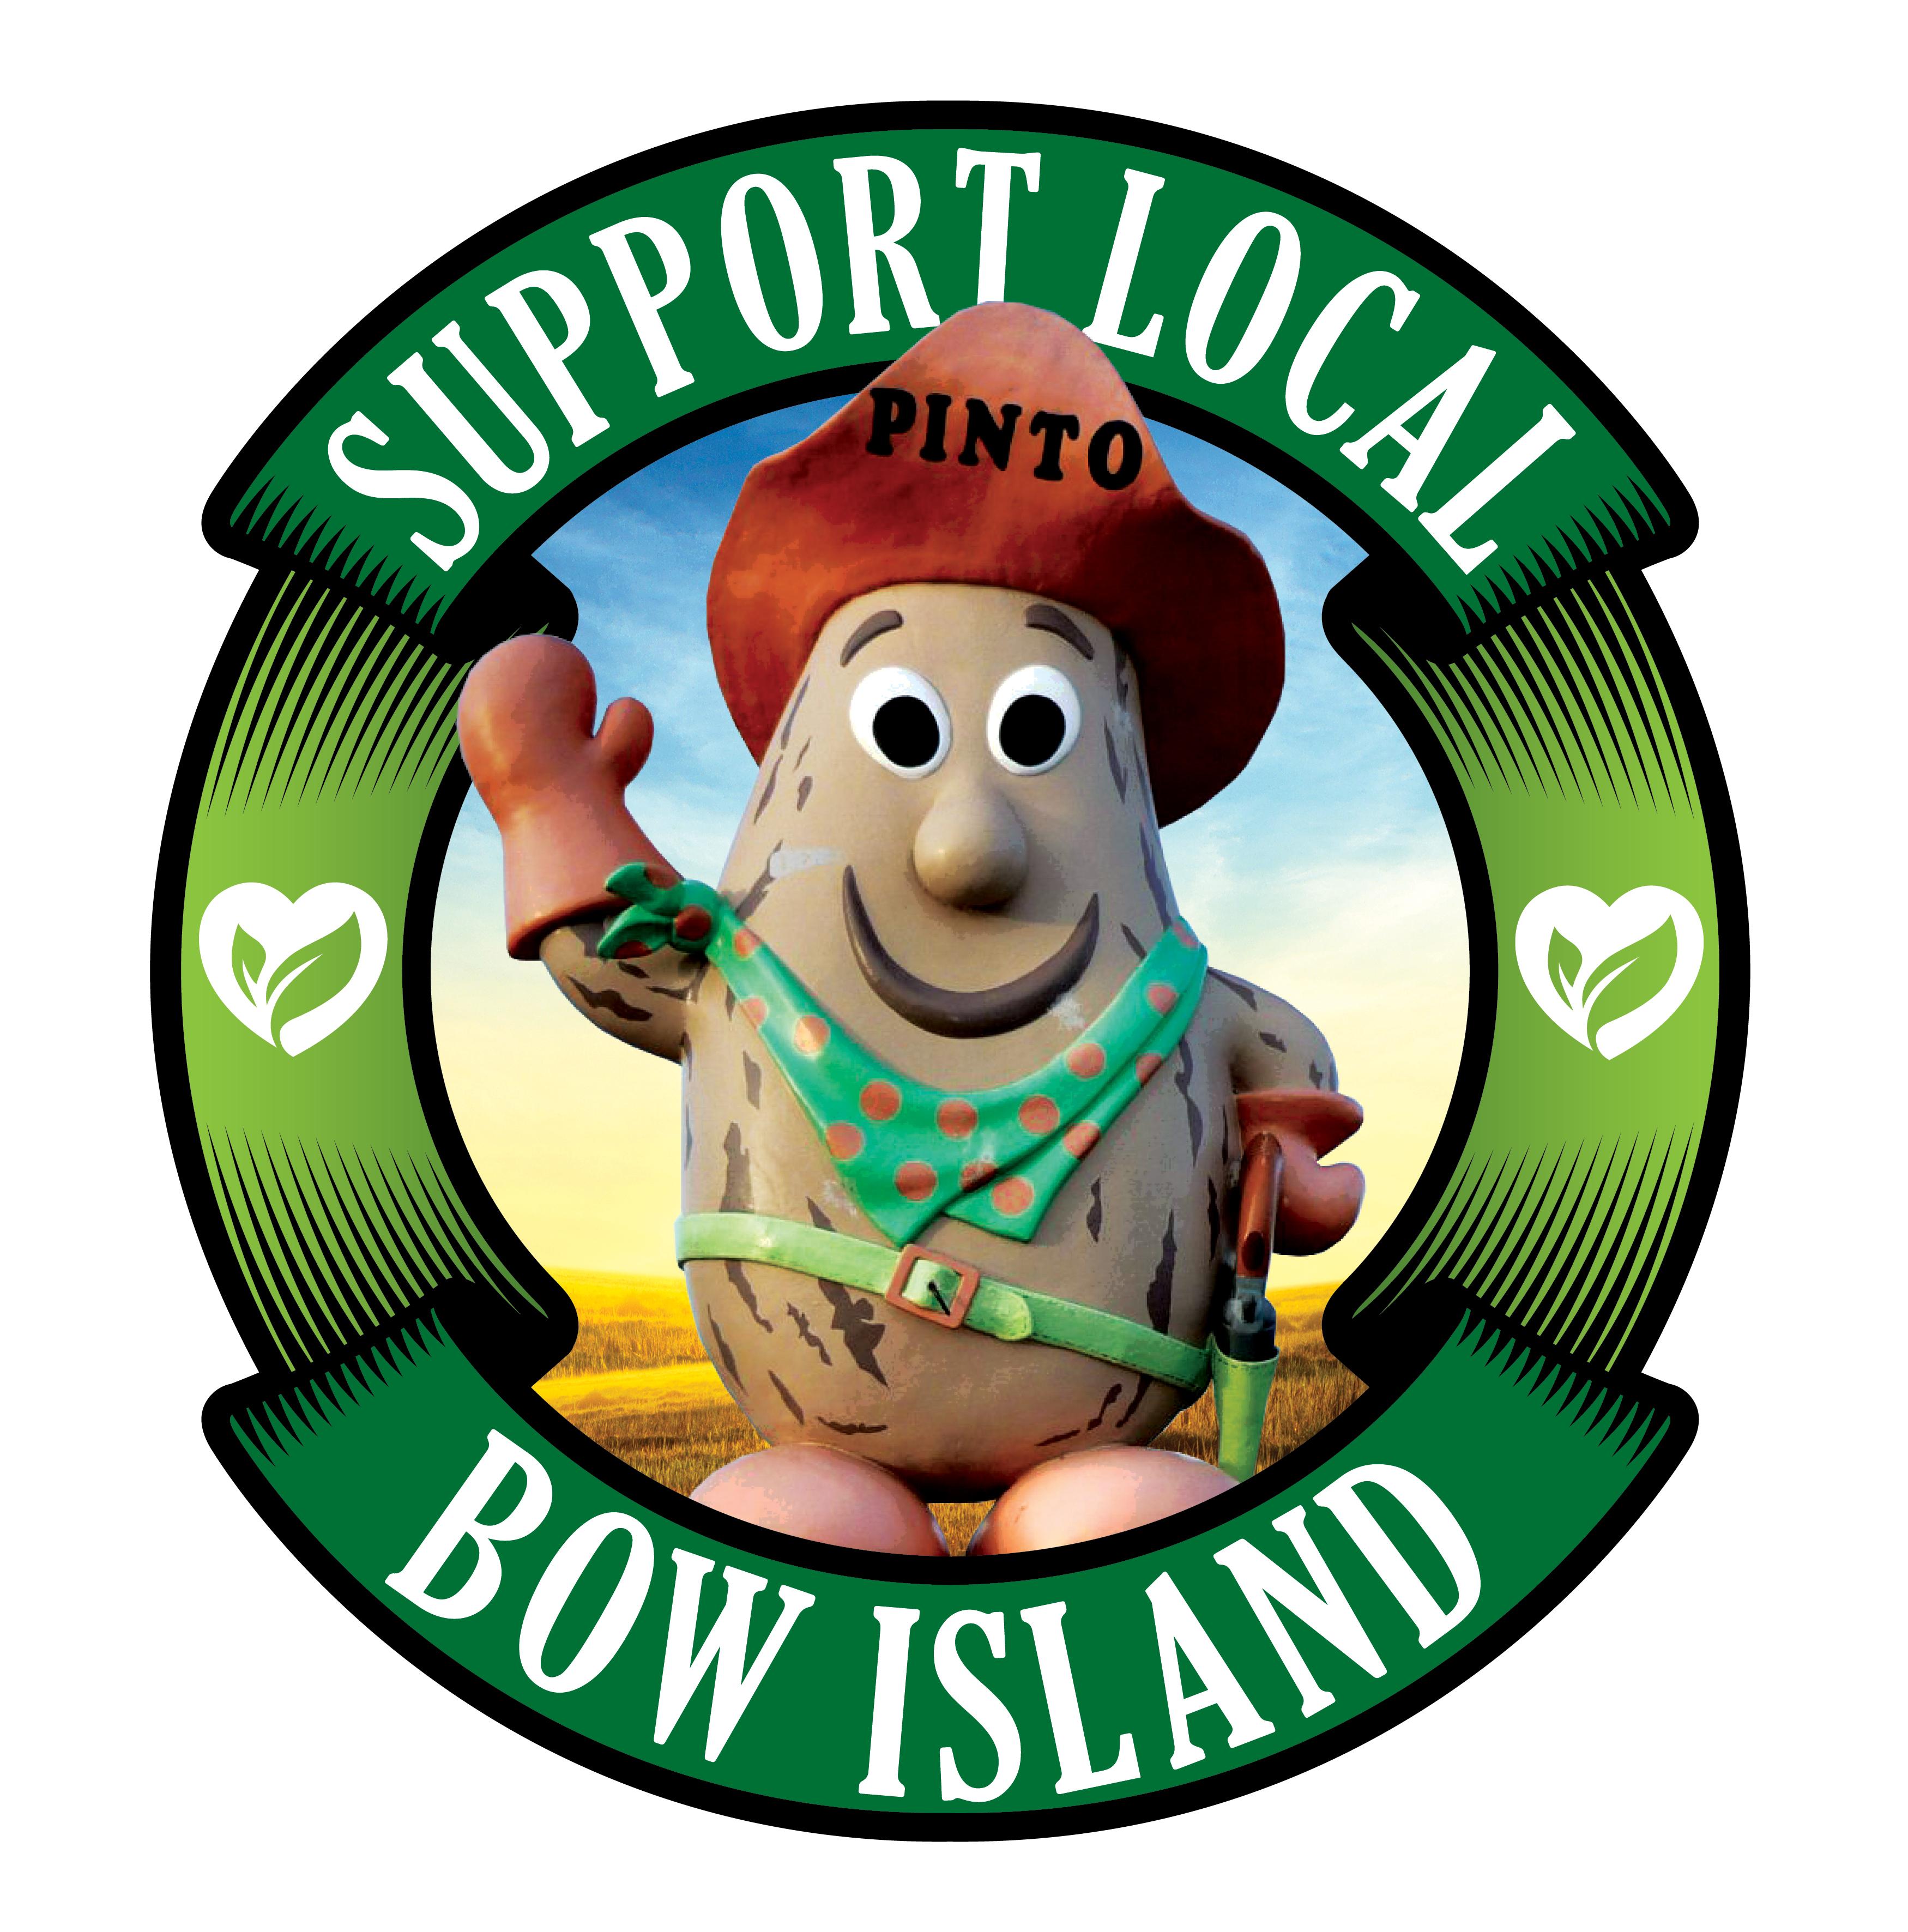 bow island pinto